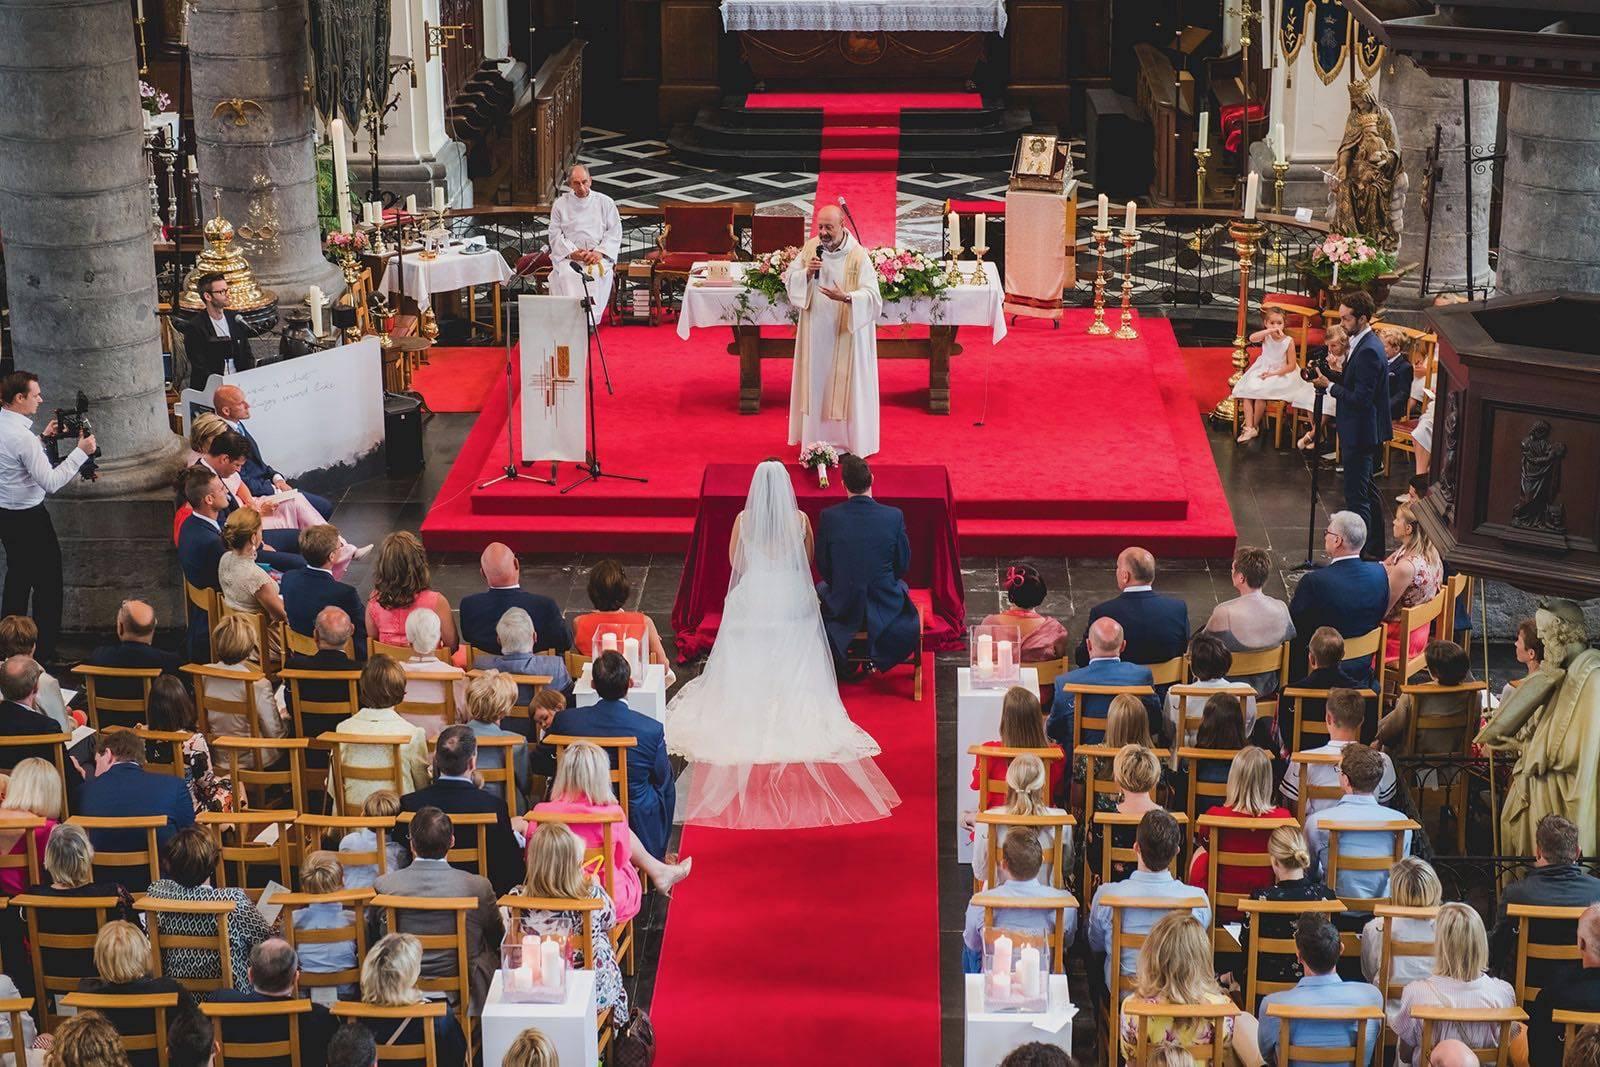 Lamont Ceremonie - Ceremonie - Fotograaf Upshot Photography - House of Weddings - 4